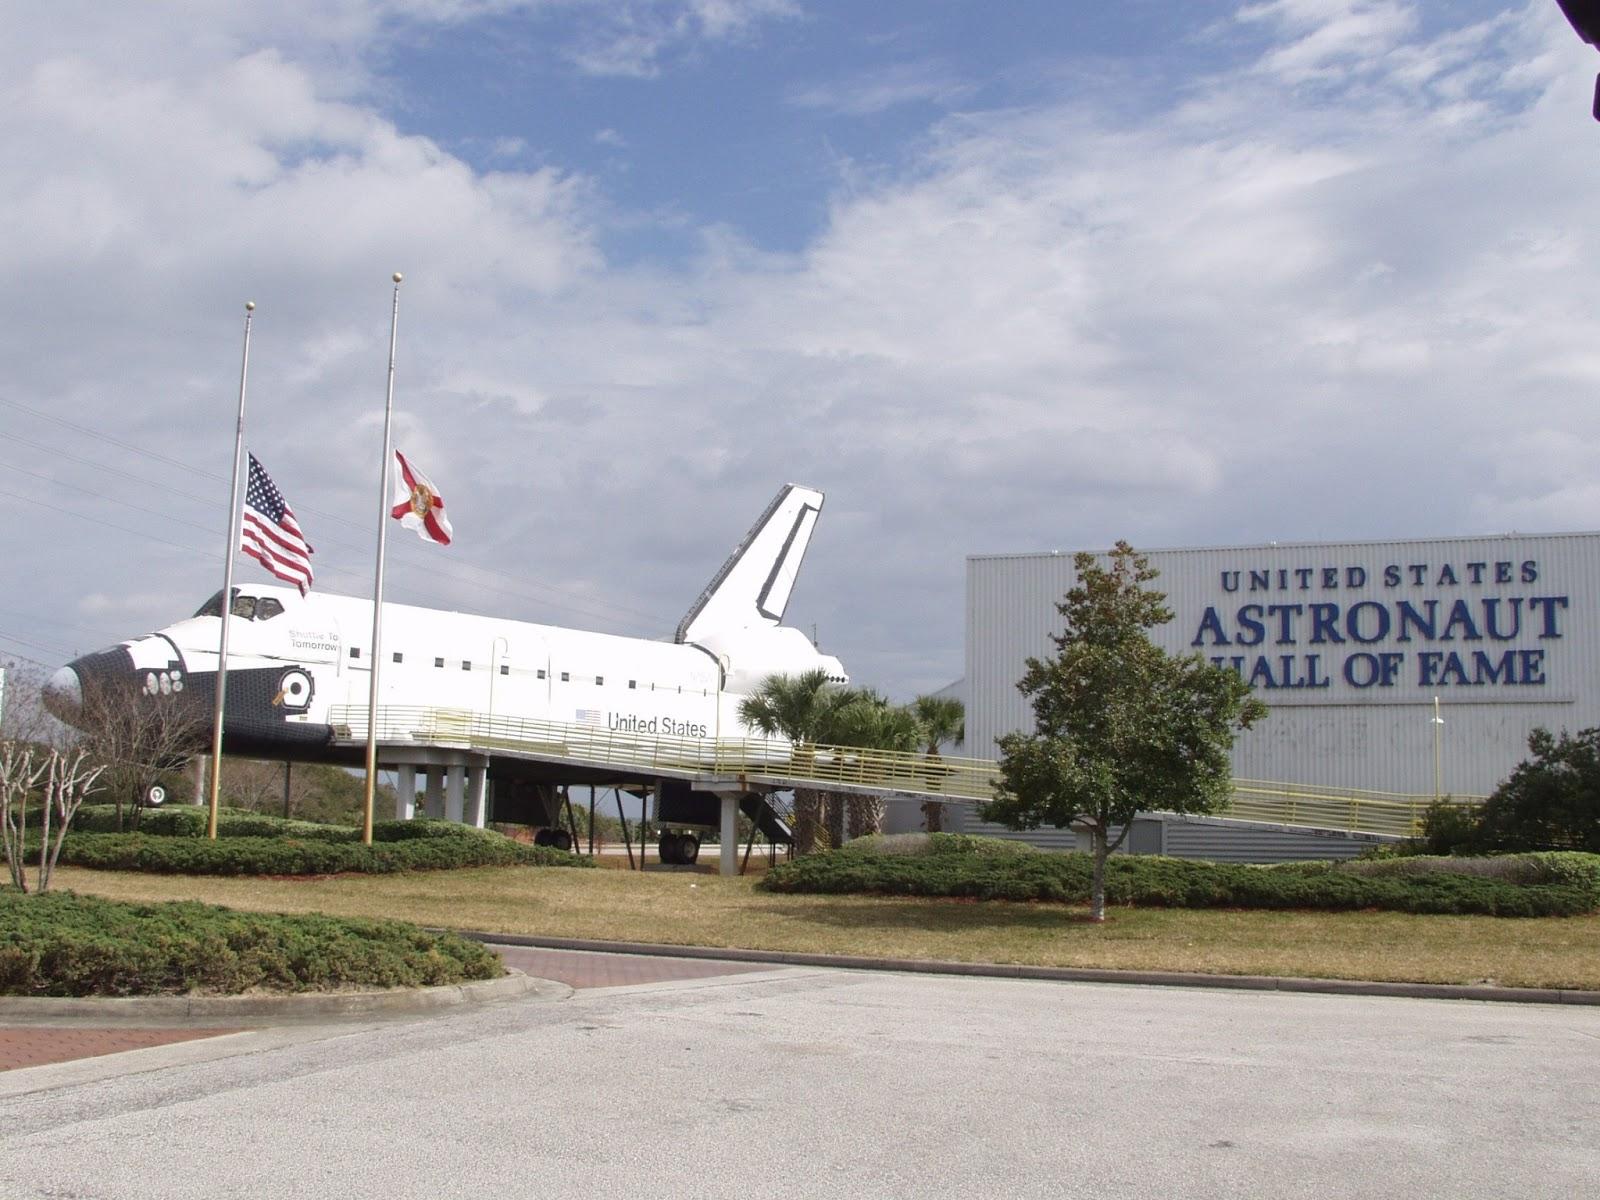 astronaut hall of fame fl - photo #12